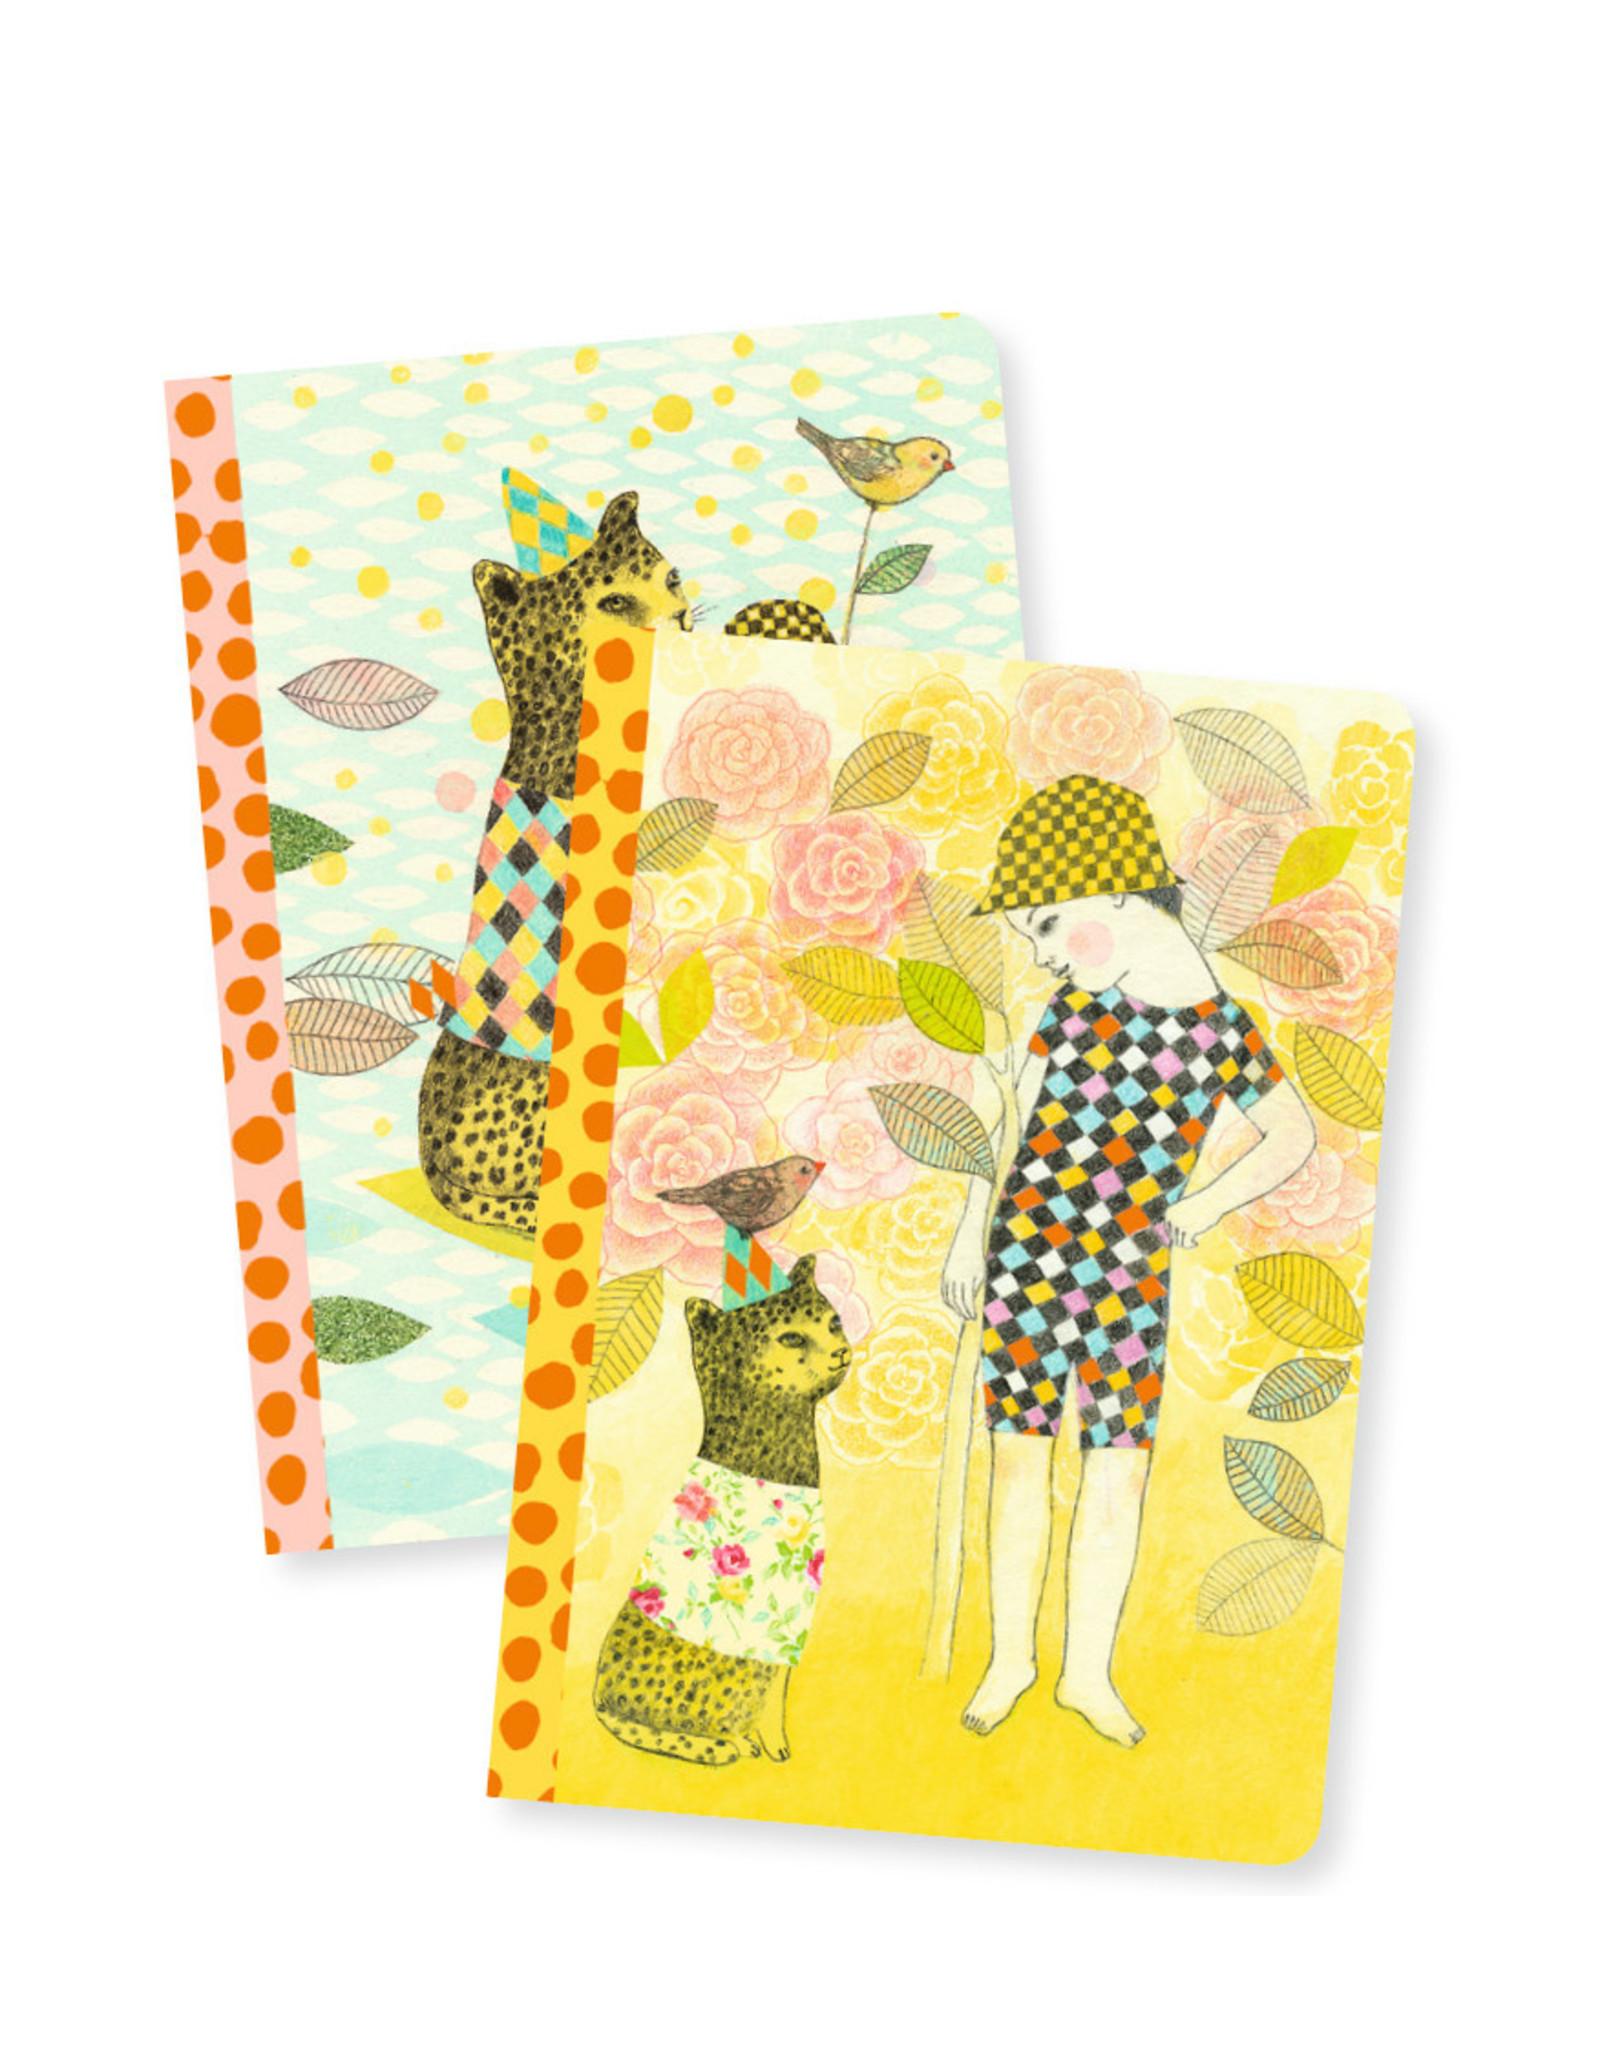 Djeco Elodie Little Notebooks